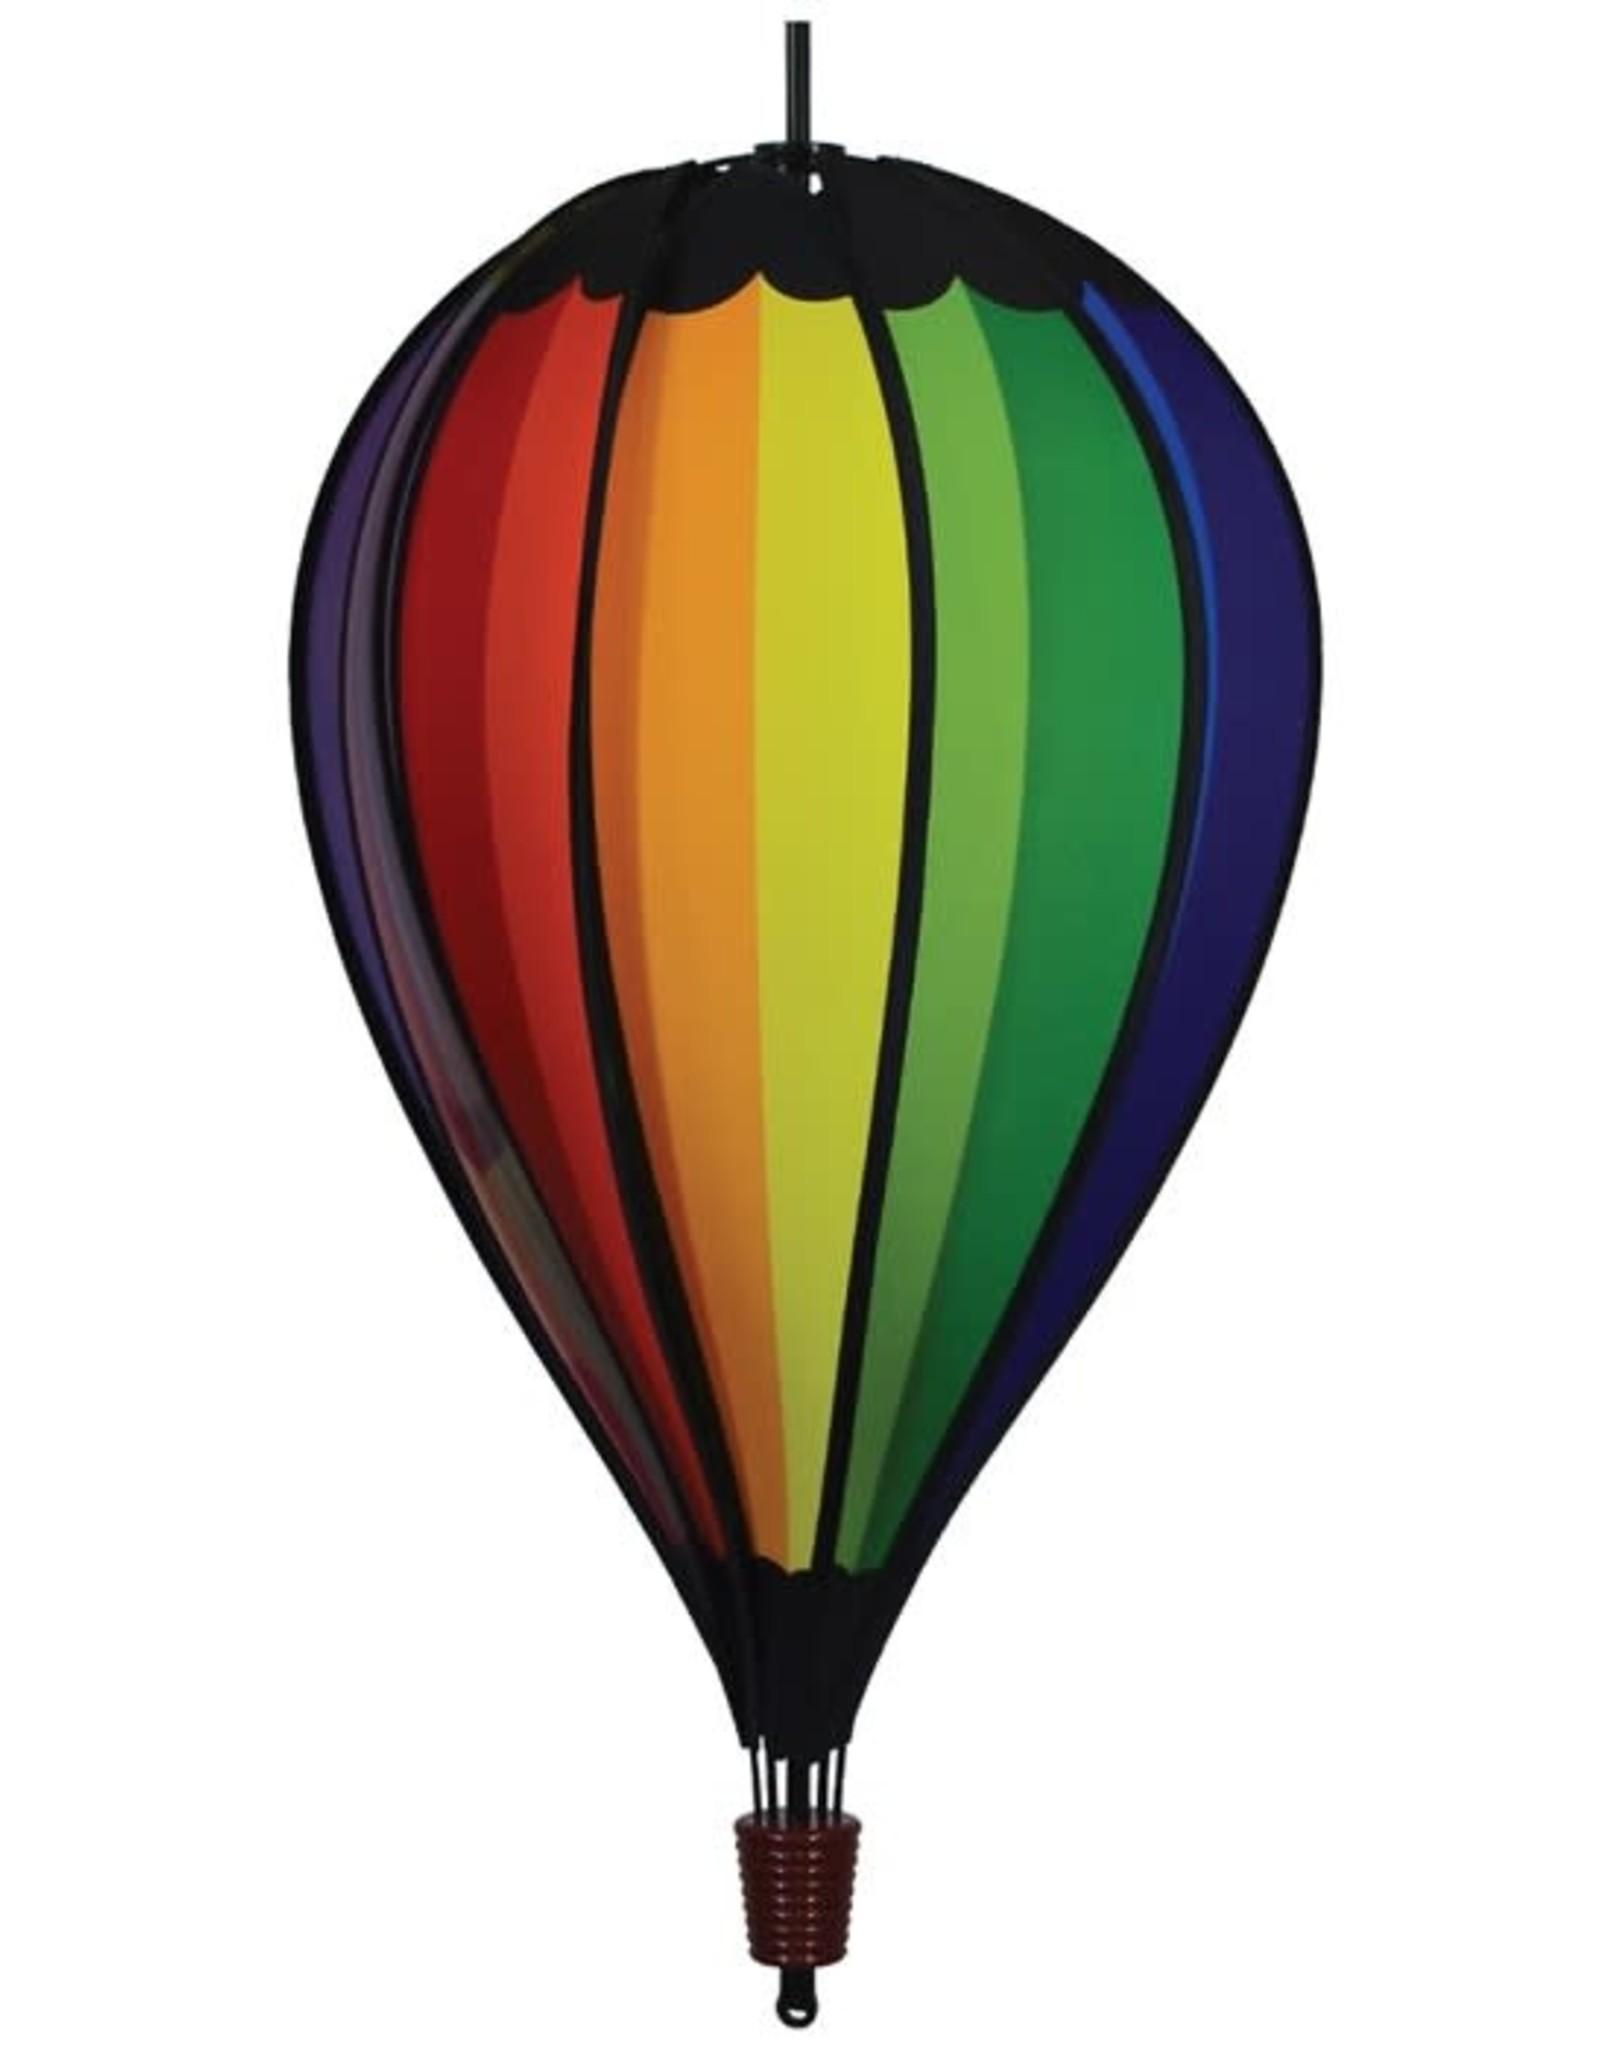 In The Breeze Hot Air Balloon Rainbow Spectrum